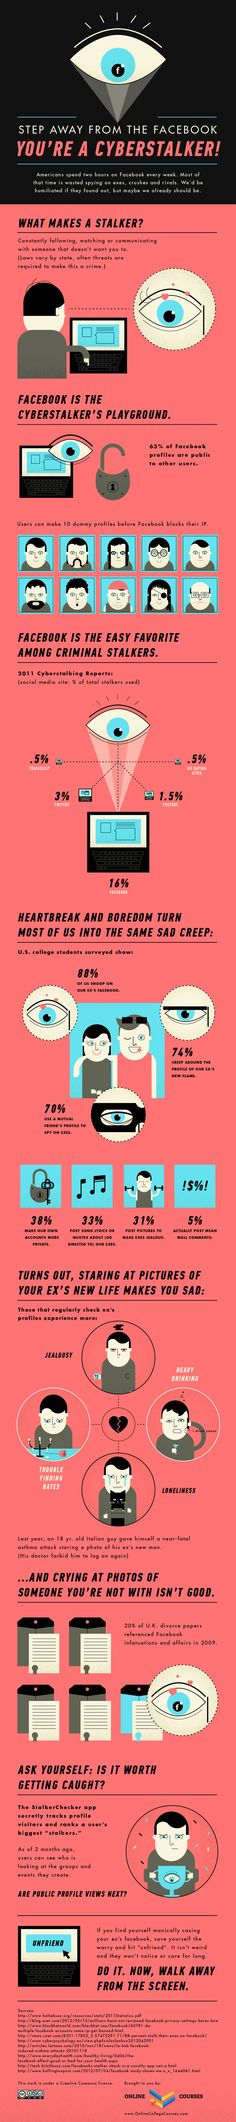 Facebook Stalking Statistics 2012